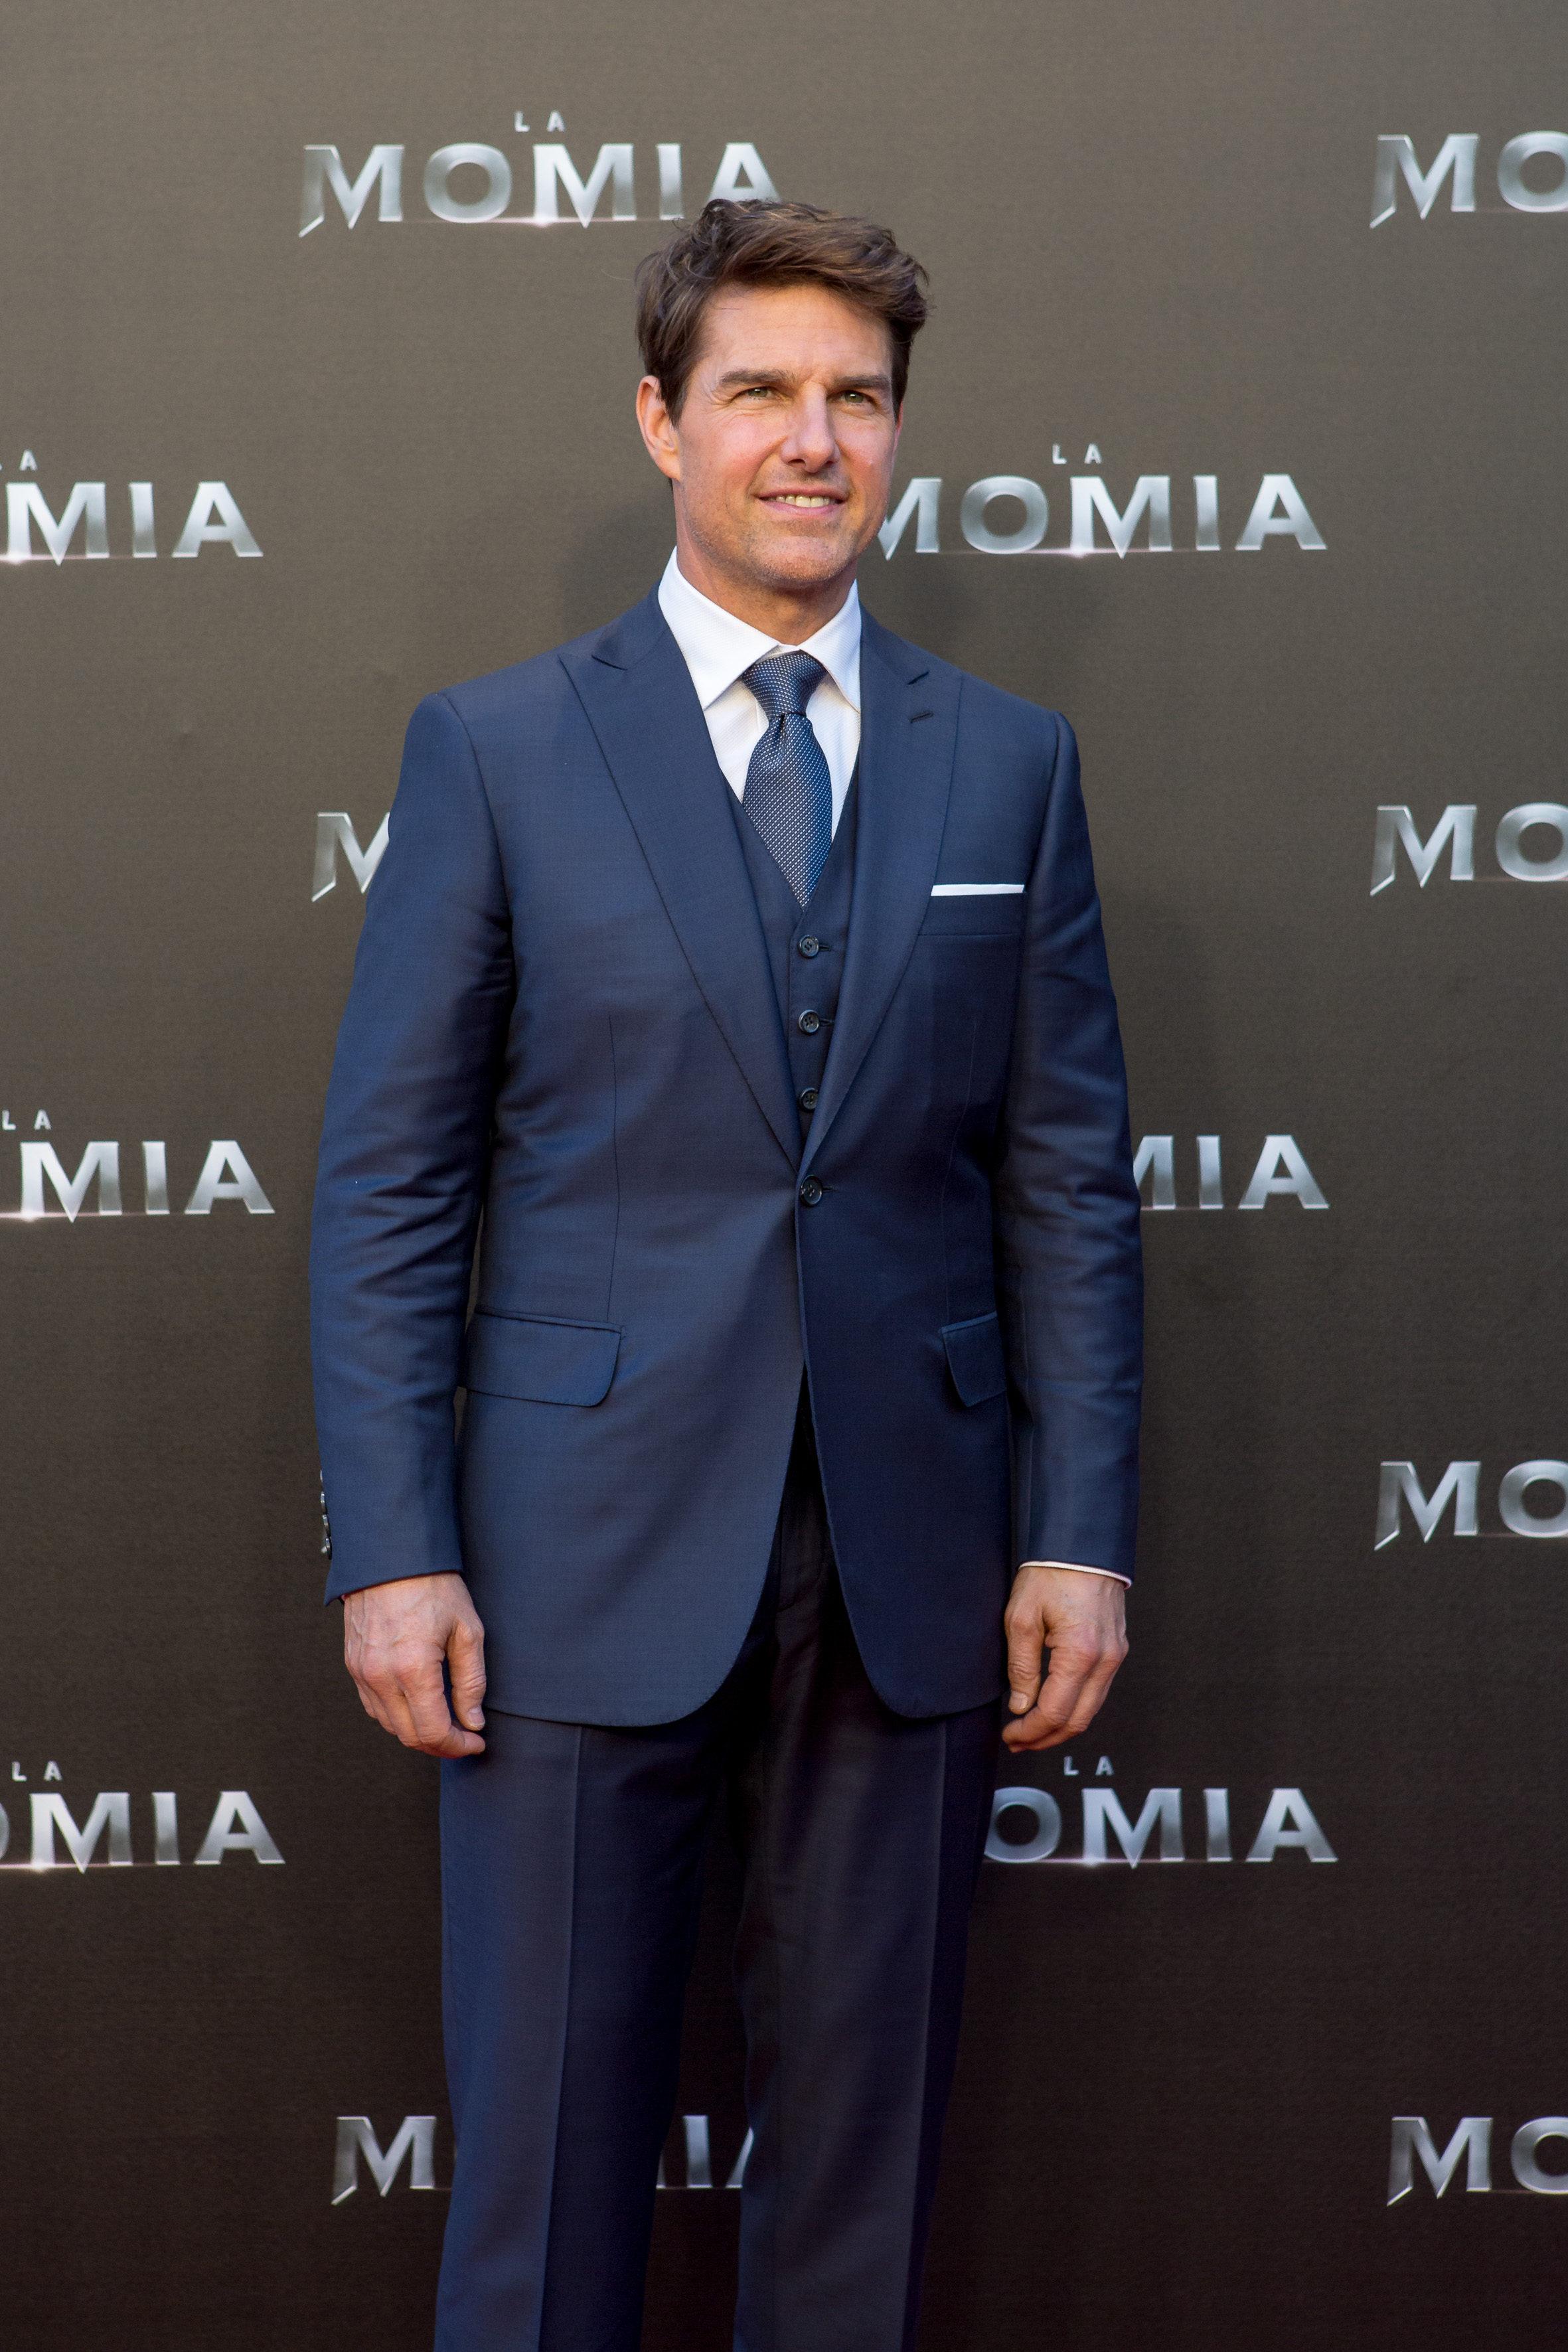 Tom Cruise, siempre elegante